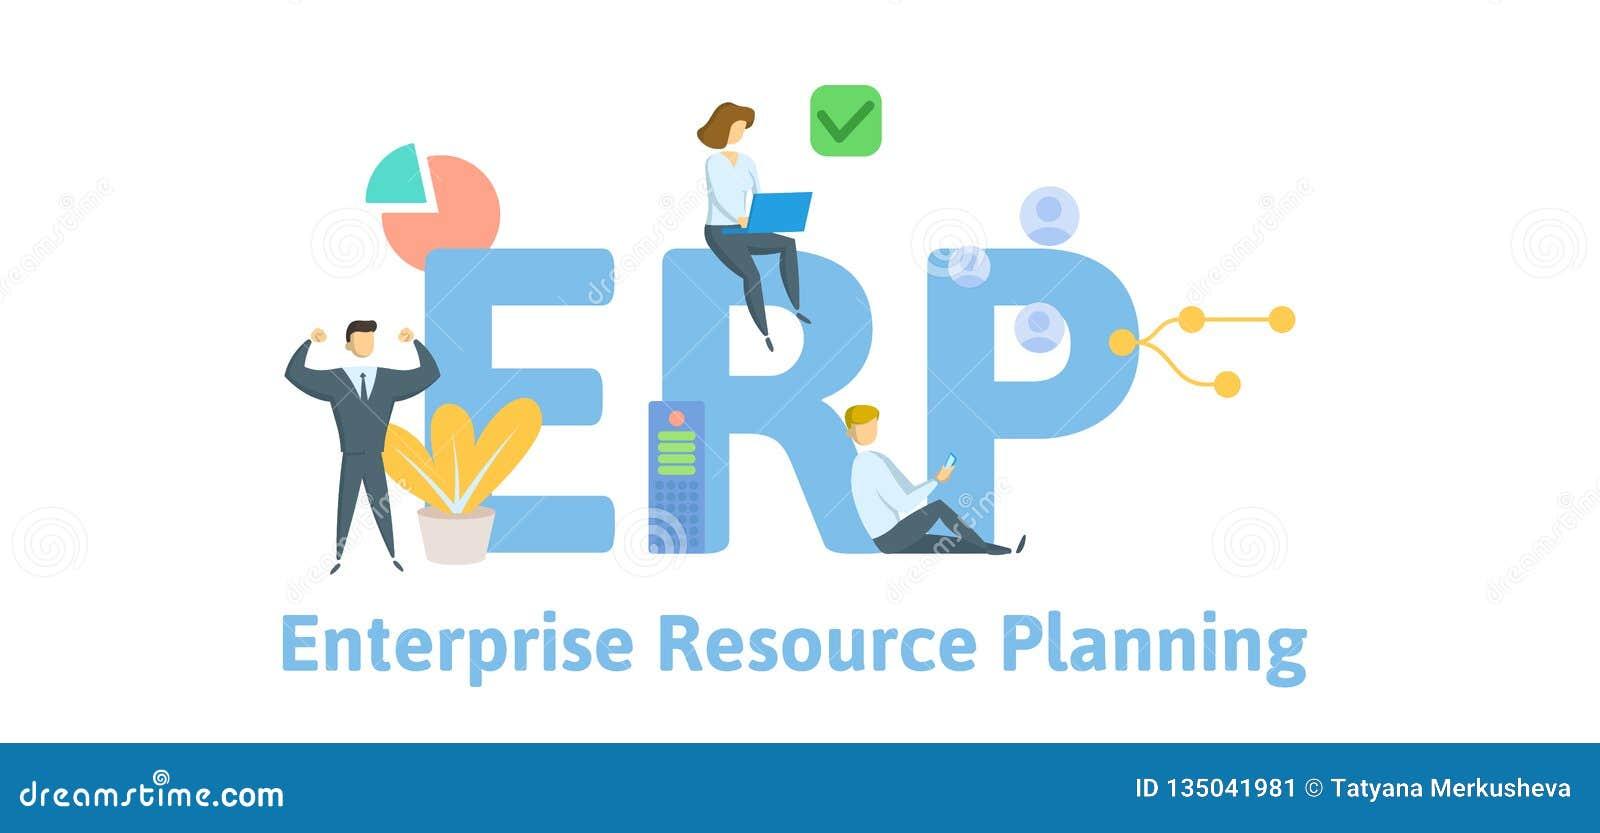 CErp, προγραμματισμός των επιχειρηματικών στοιχείων συμπεριφοράς Έννοια με τις λέξεις κλειδιά, τις επιστολές και τα εικονίδια Επί